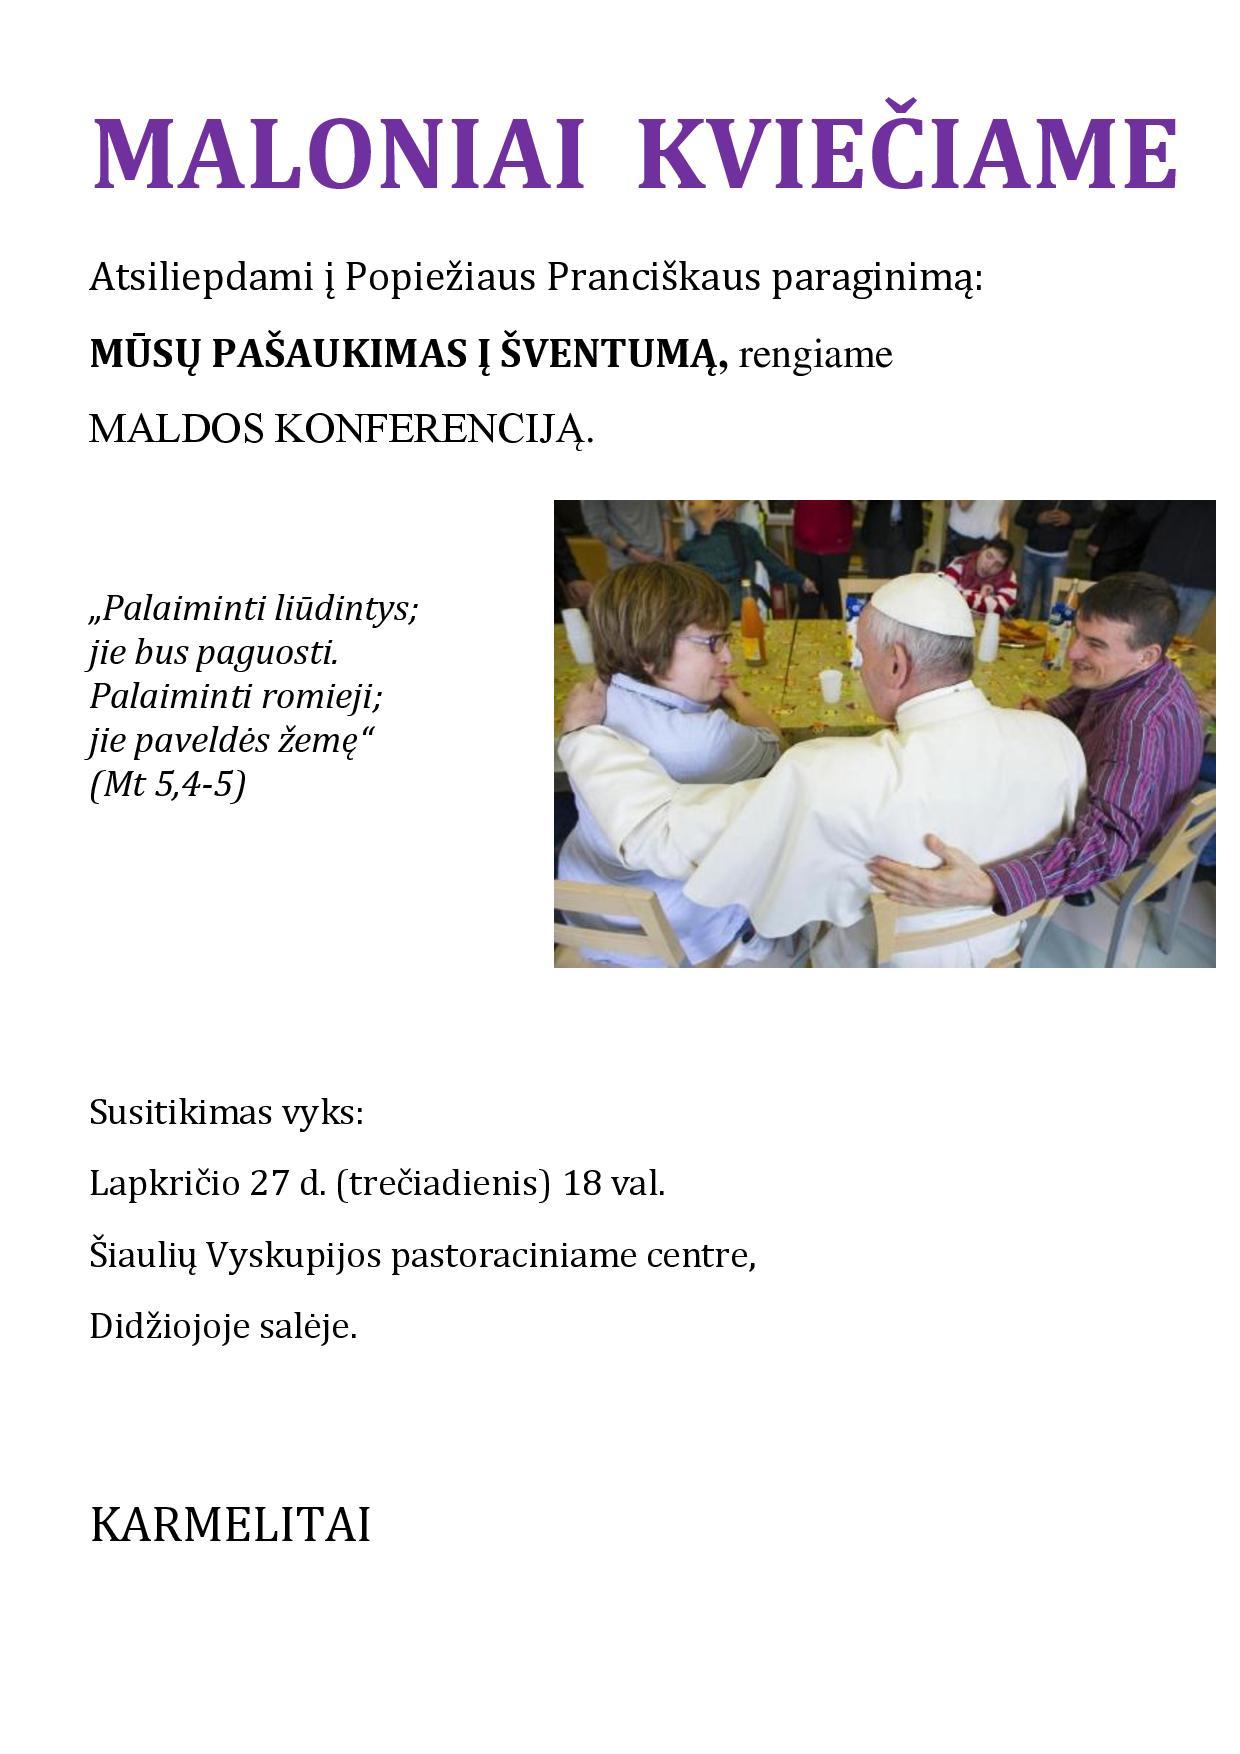 Pop.Pracisus gaudete at exultatte-page-001